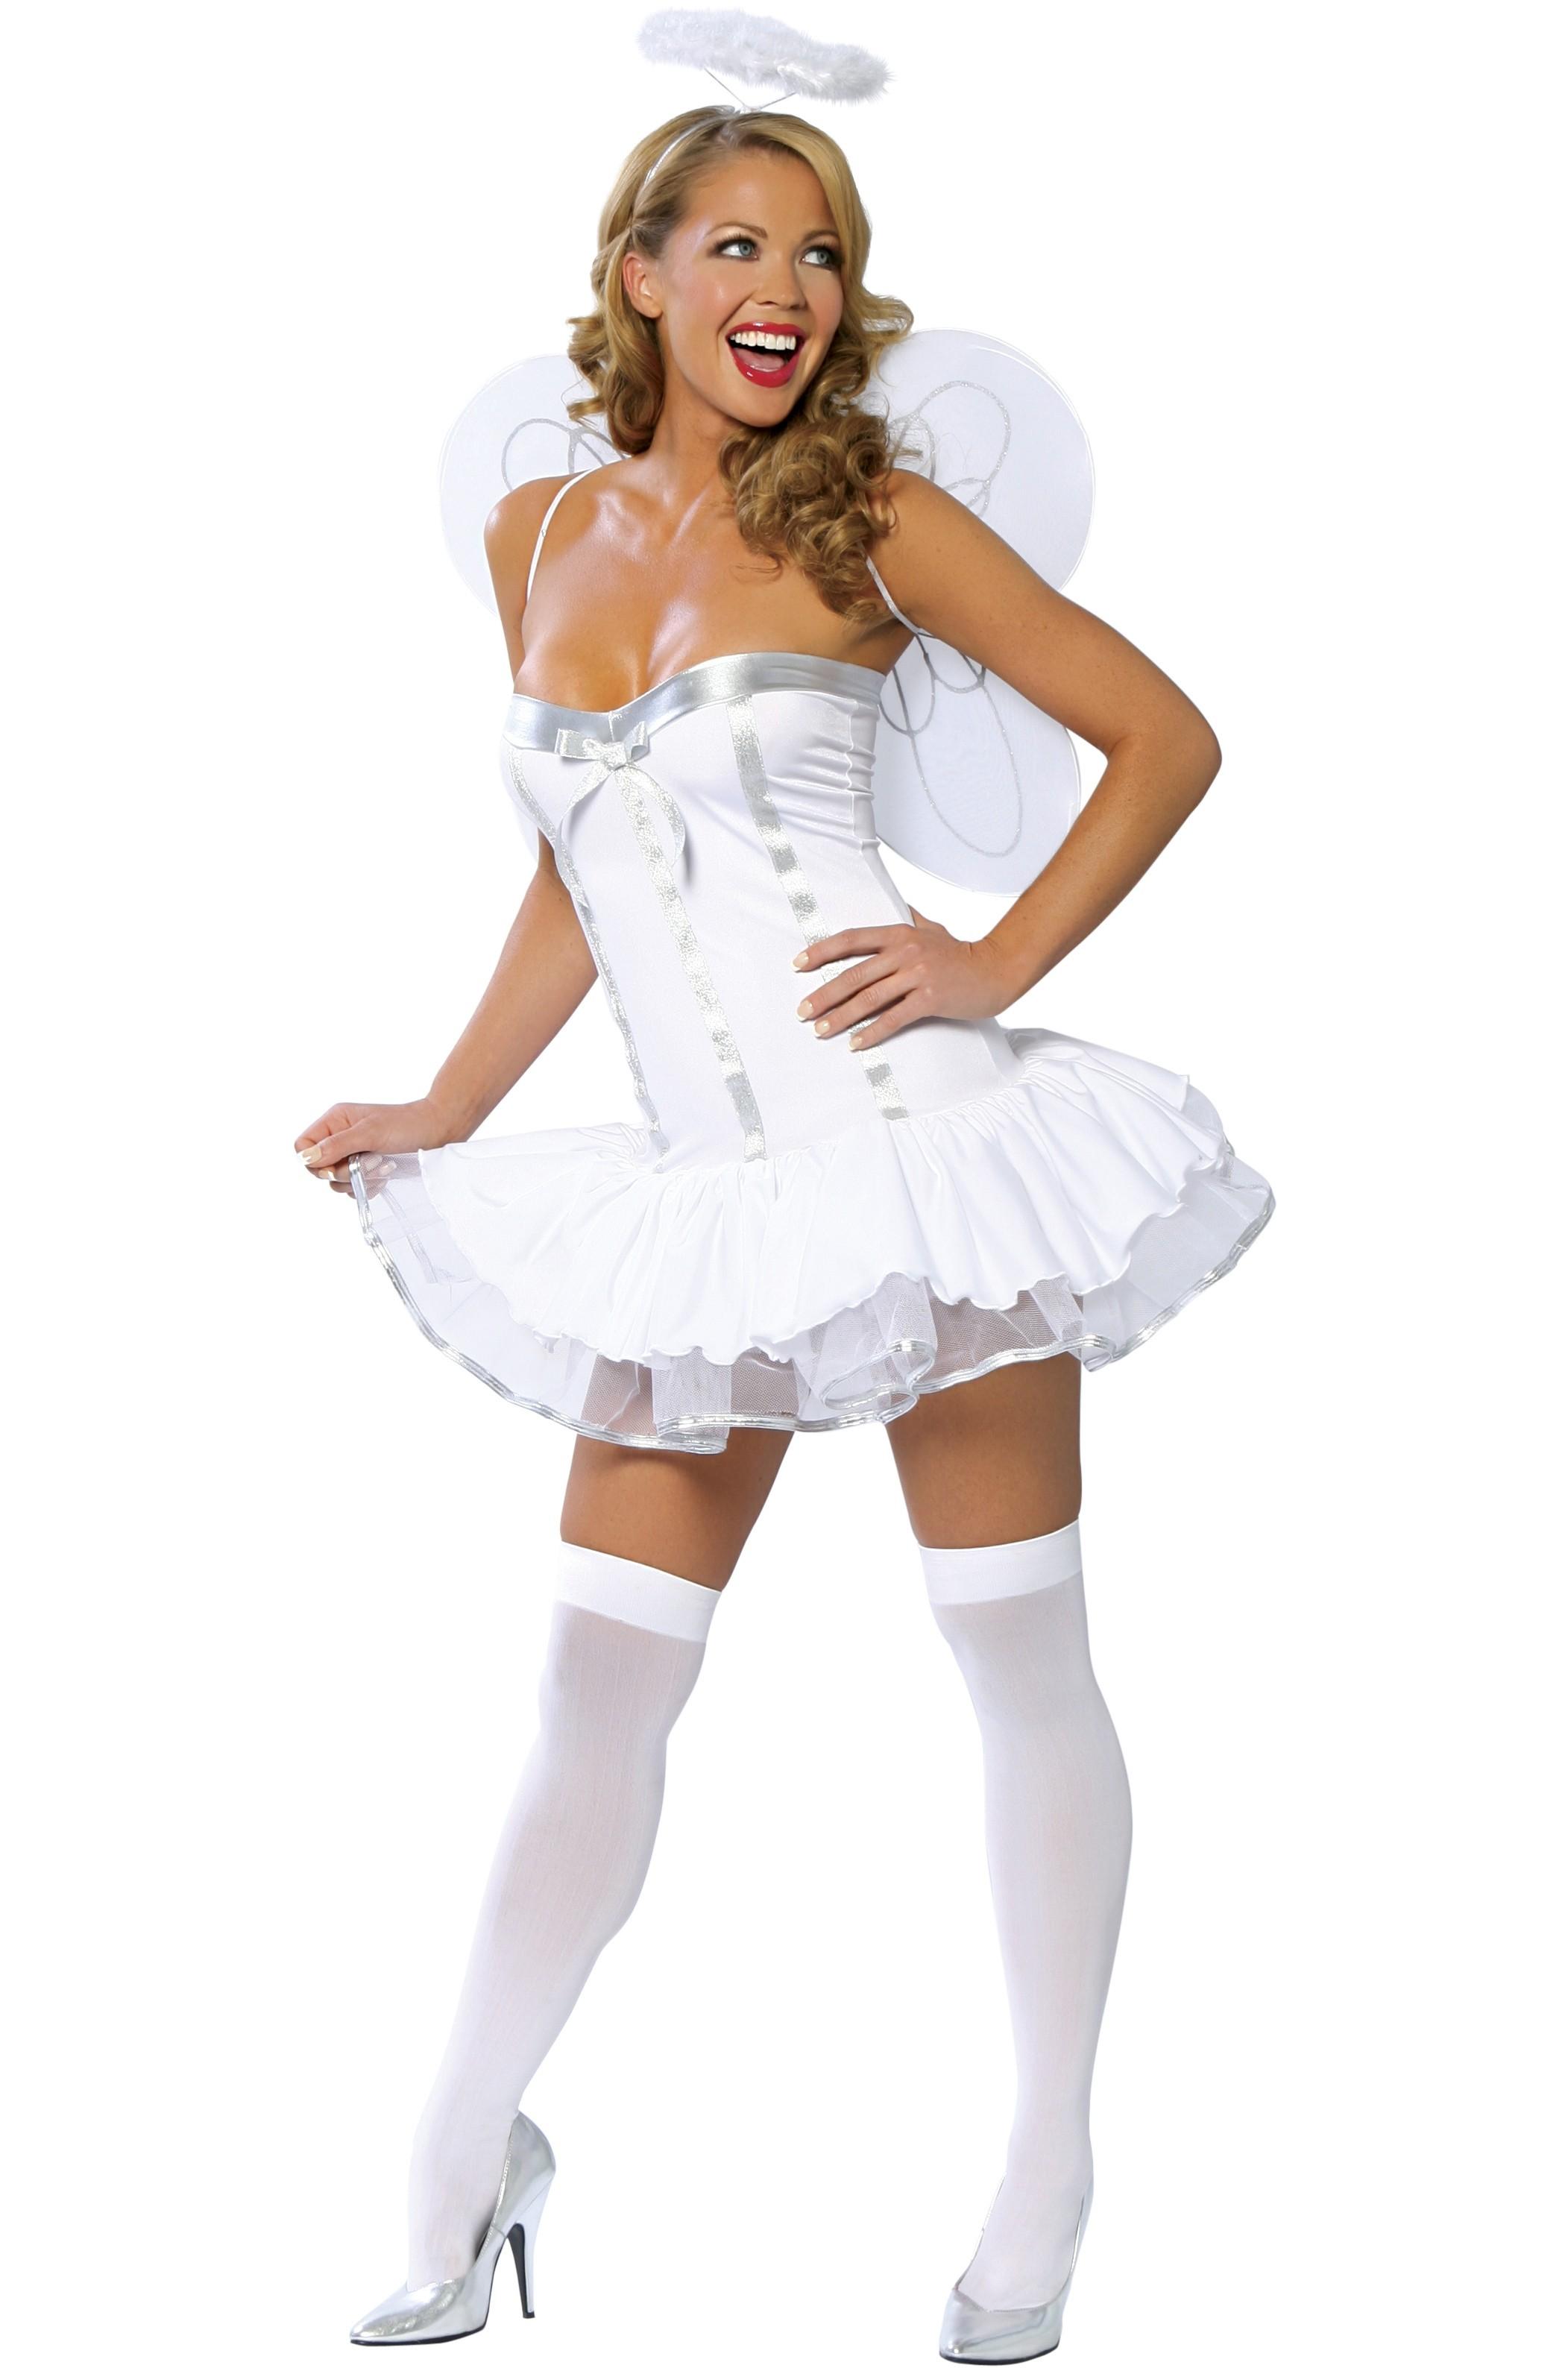 Костюм ангелочка (42-44) пижама жен mia cara майка шорты botanical aw15 ubl lst 264 р 42 44 1119503